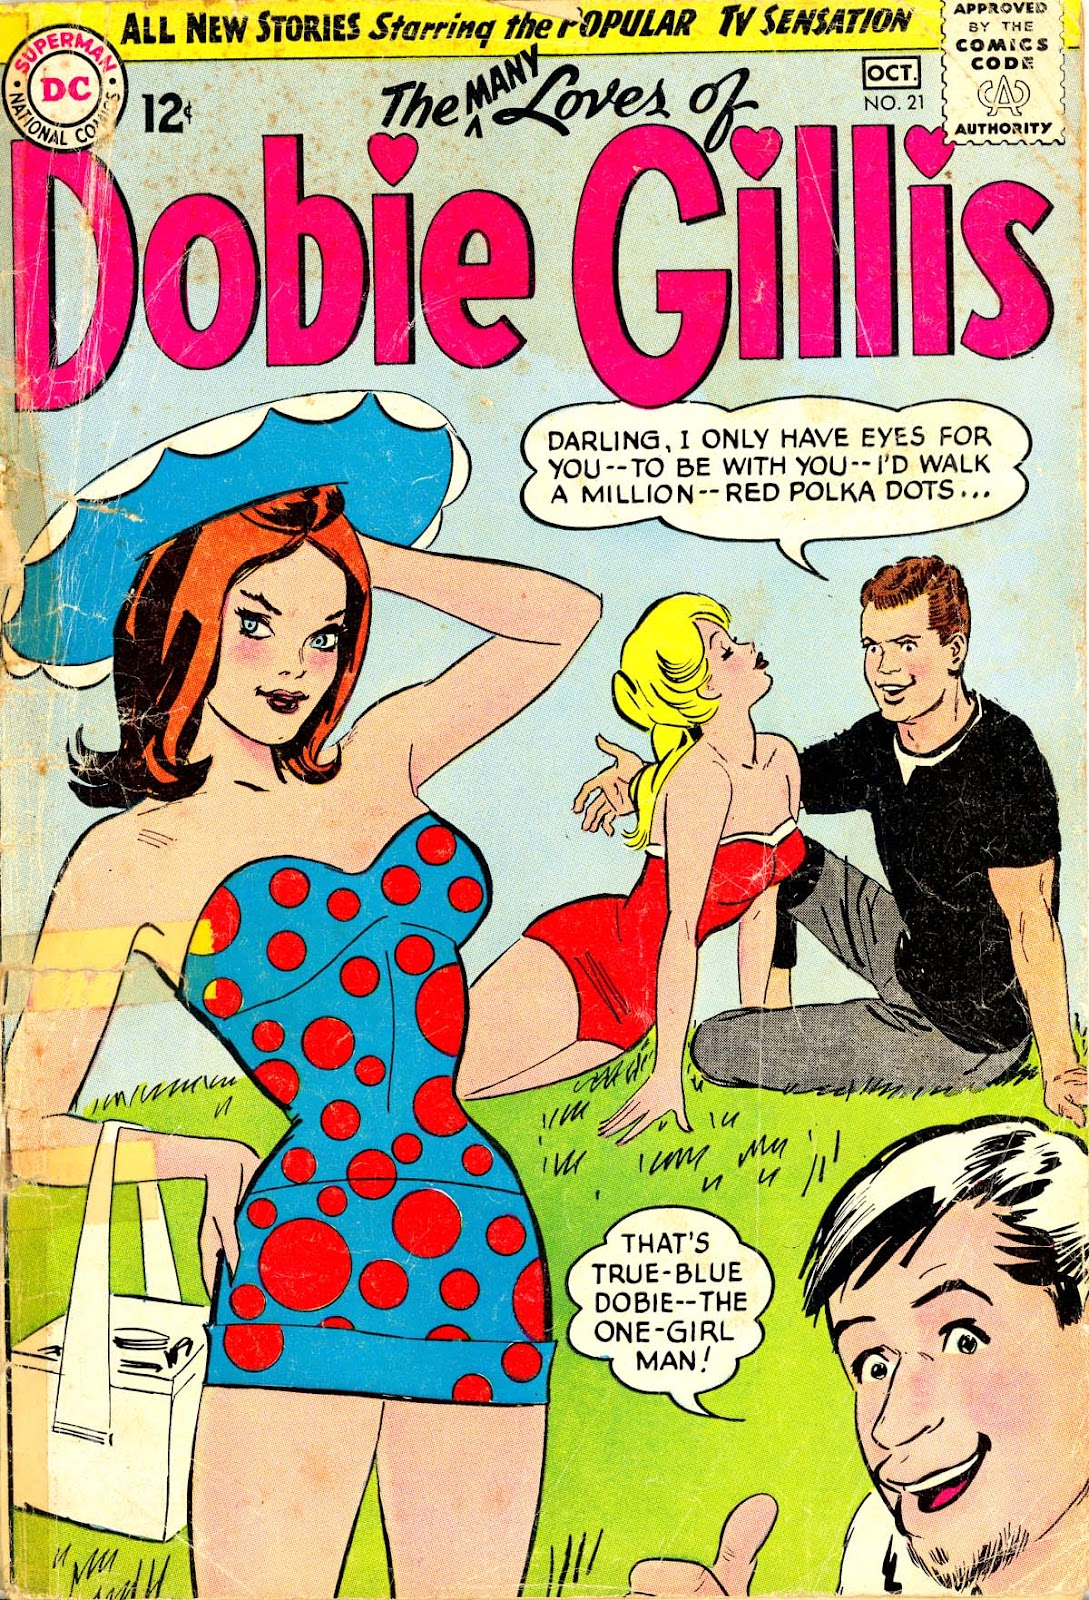 Many Loves of Dobie Gillis 21 Page 1